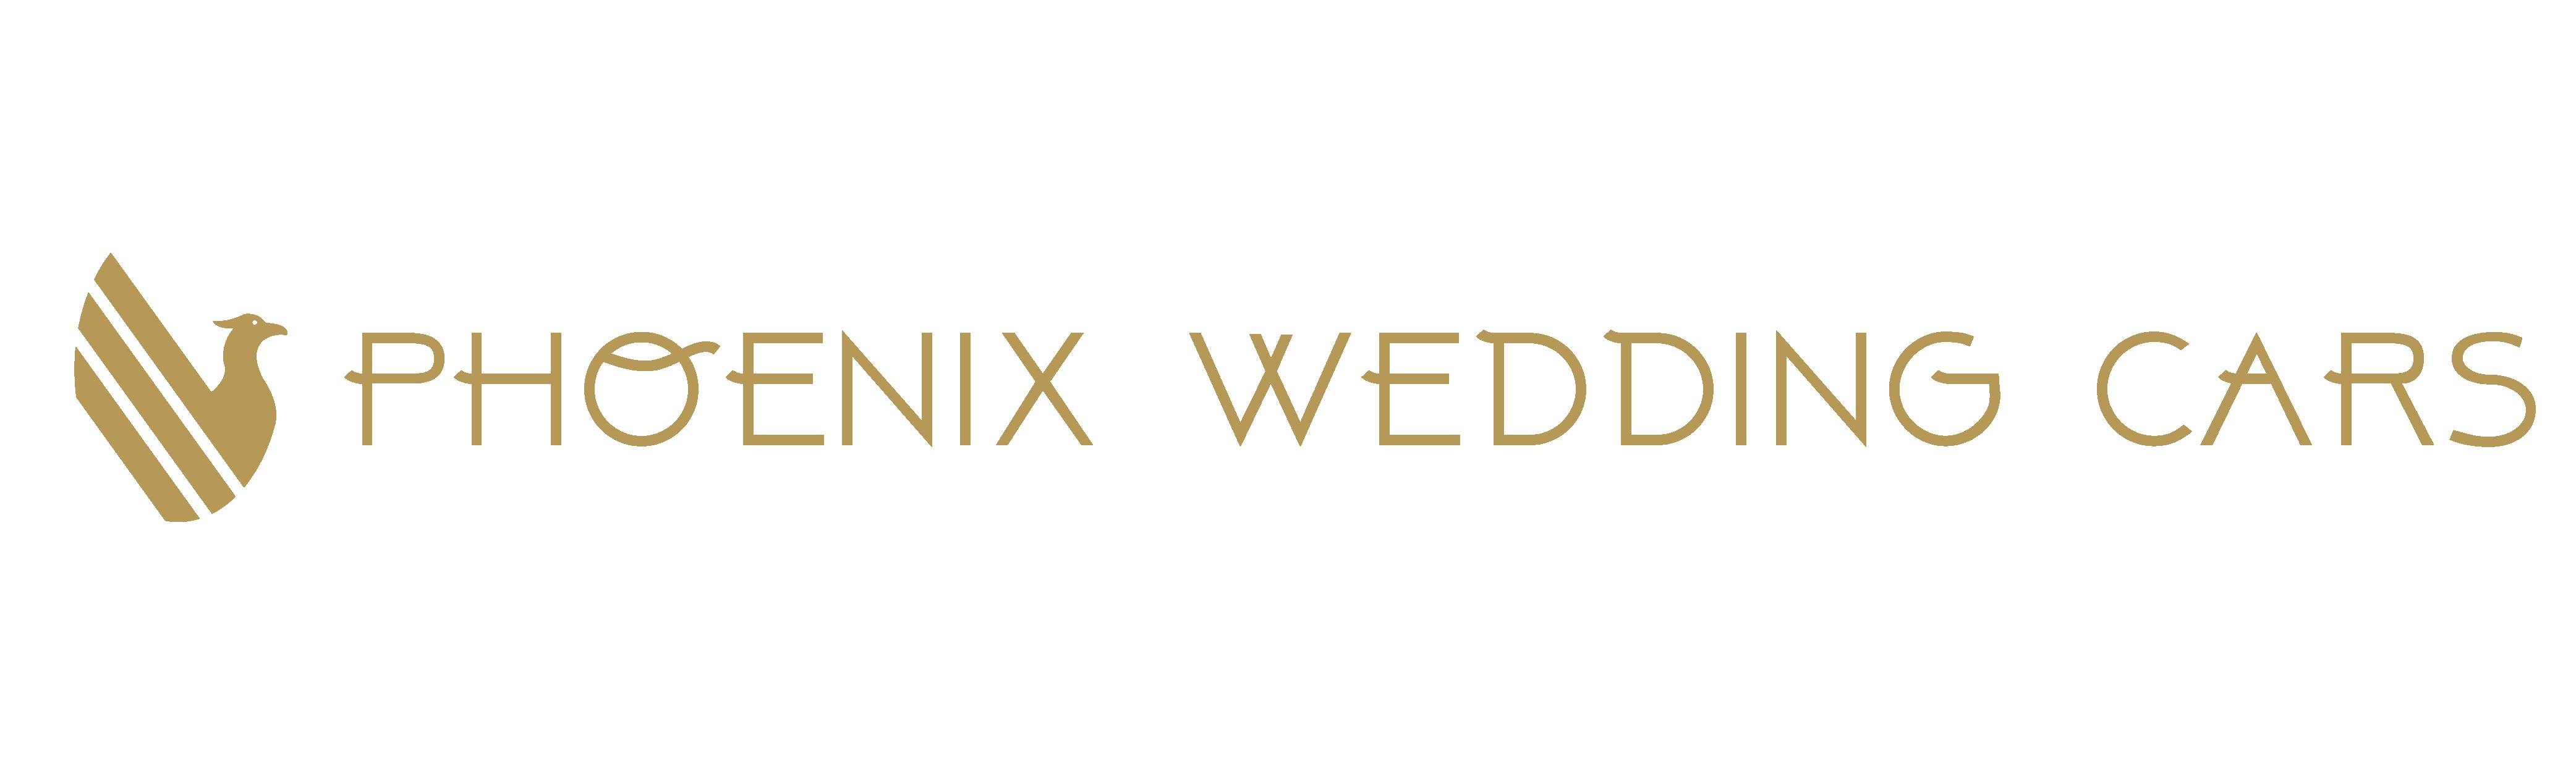 Phoenix Wedding Cars